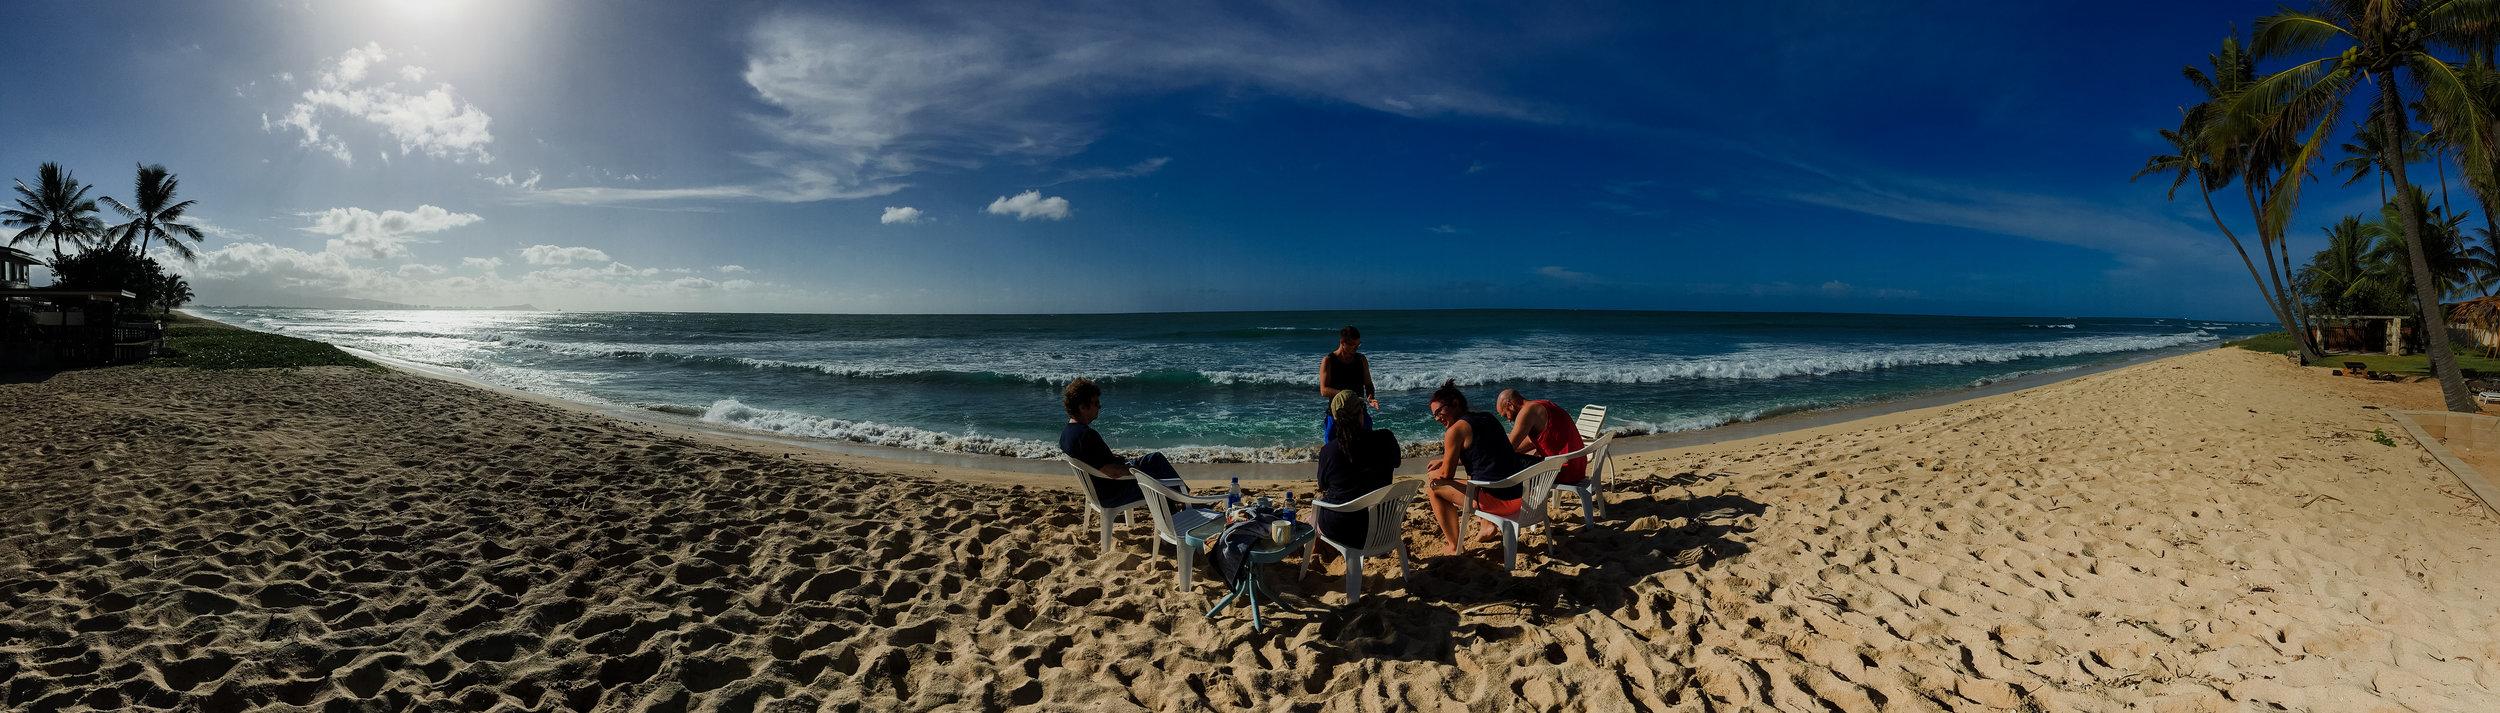 meagans hawaii pics-7.jpg